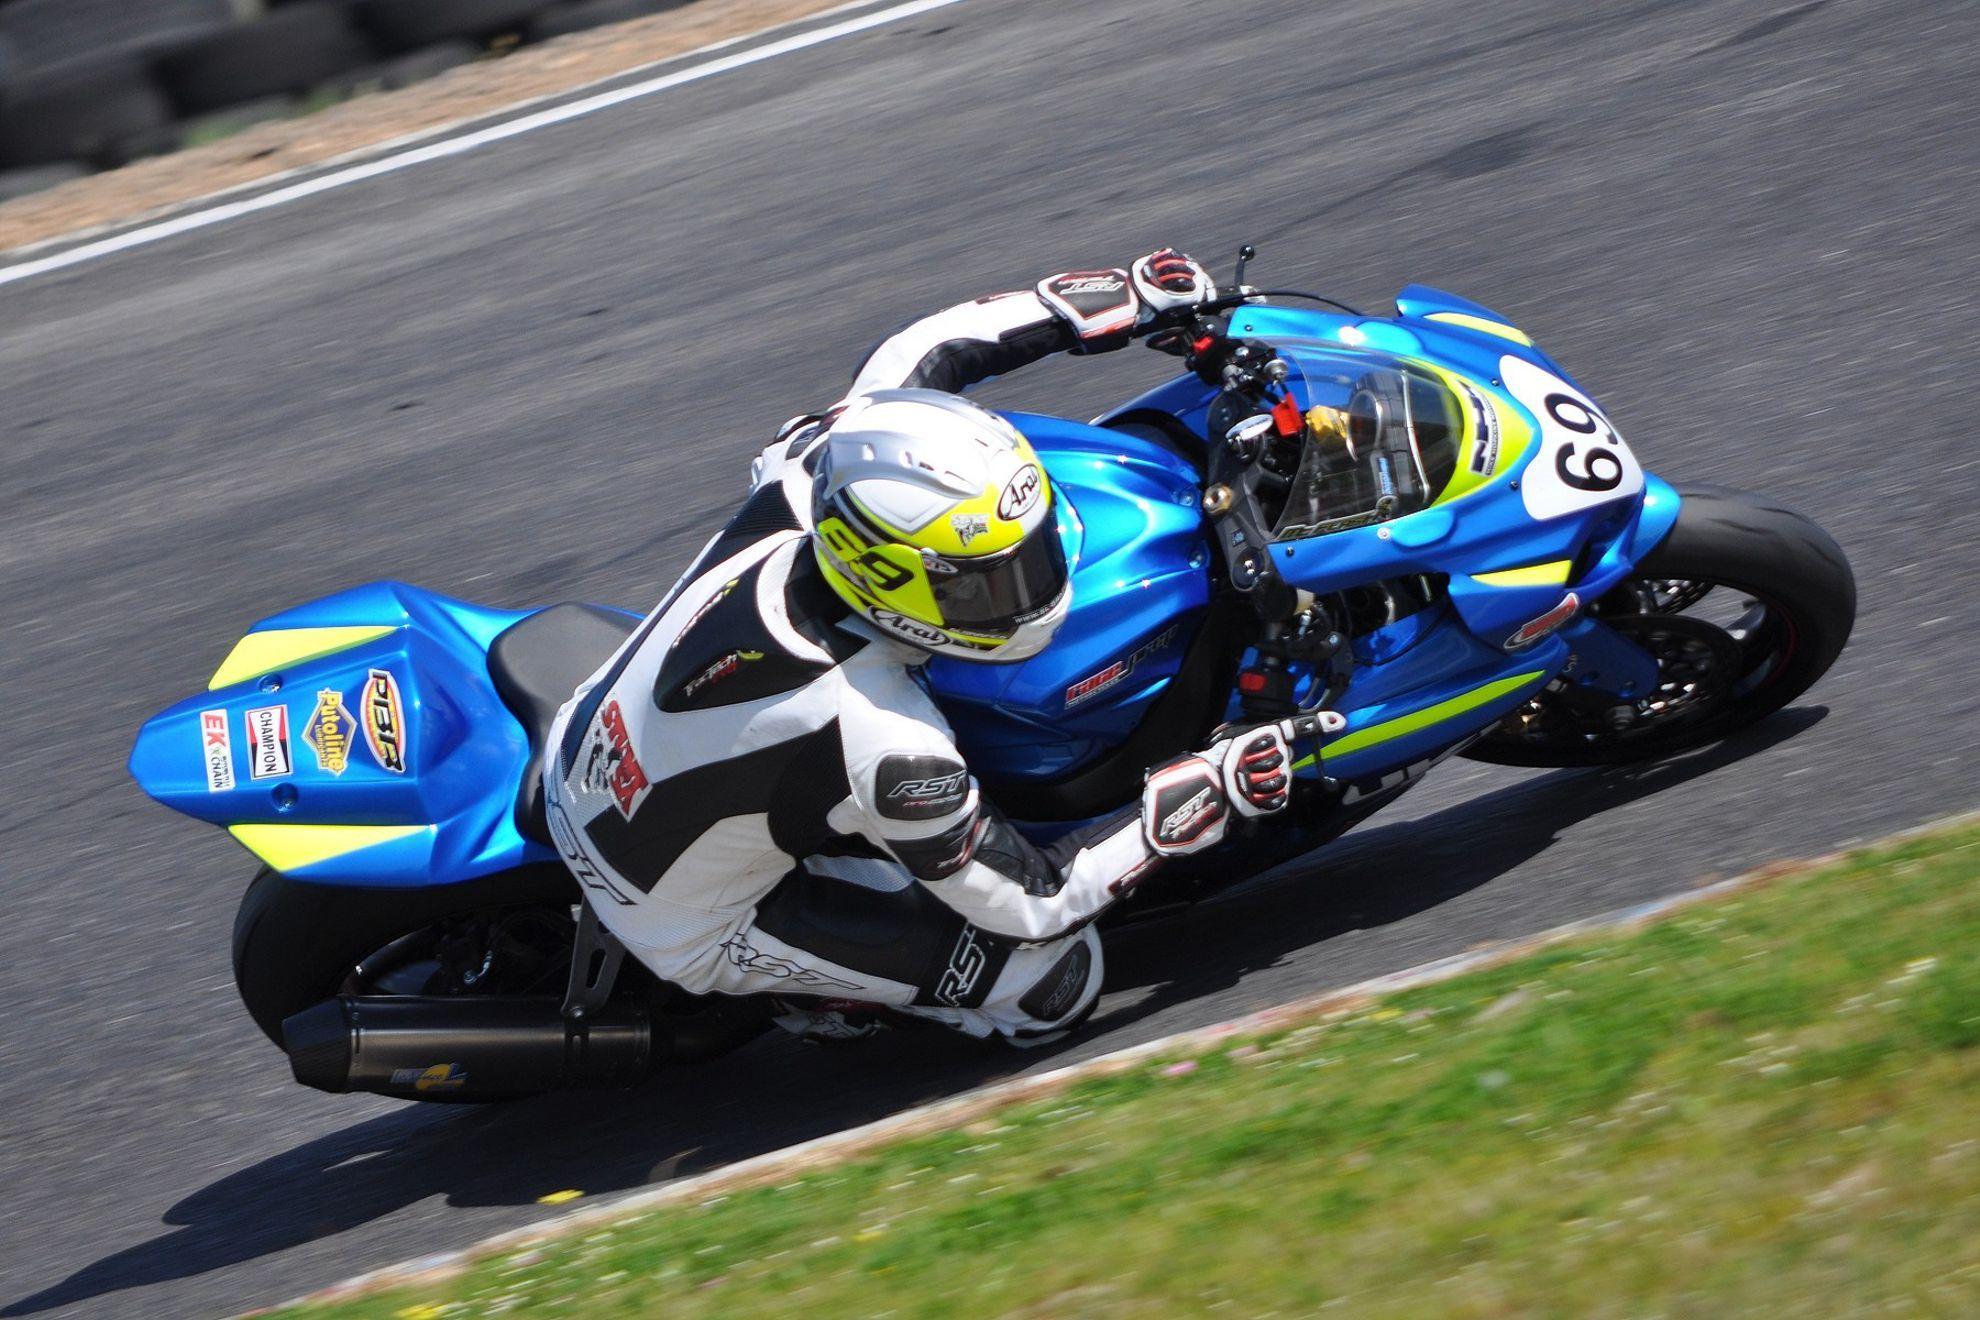 SUZUKI SUPERBIKE NEWBIE CONTROL IN DEBUT RACE Racing, Suzuki